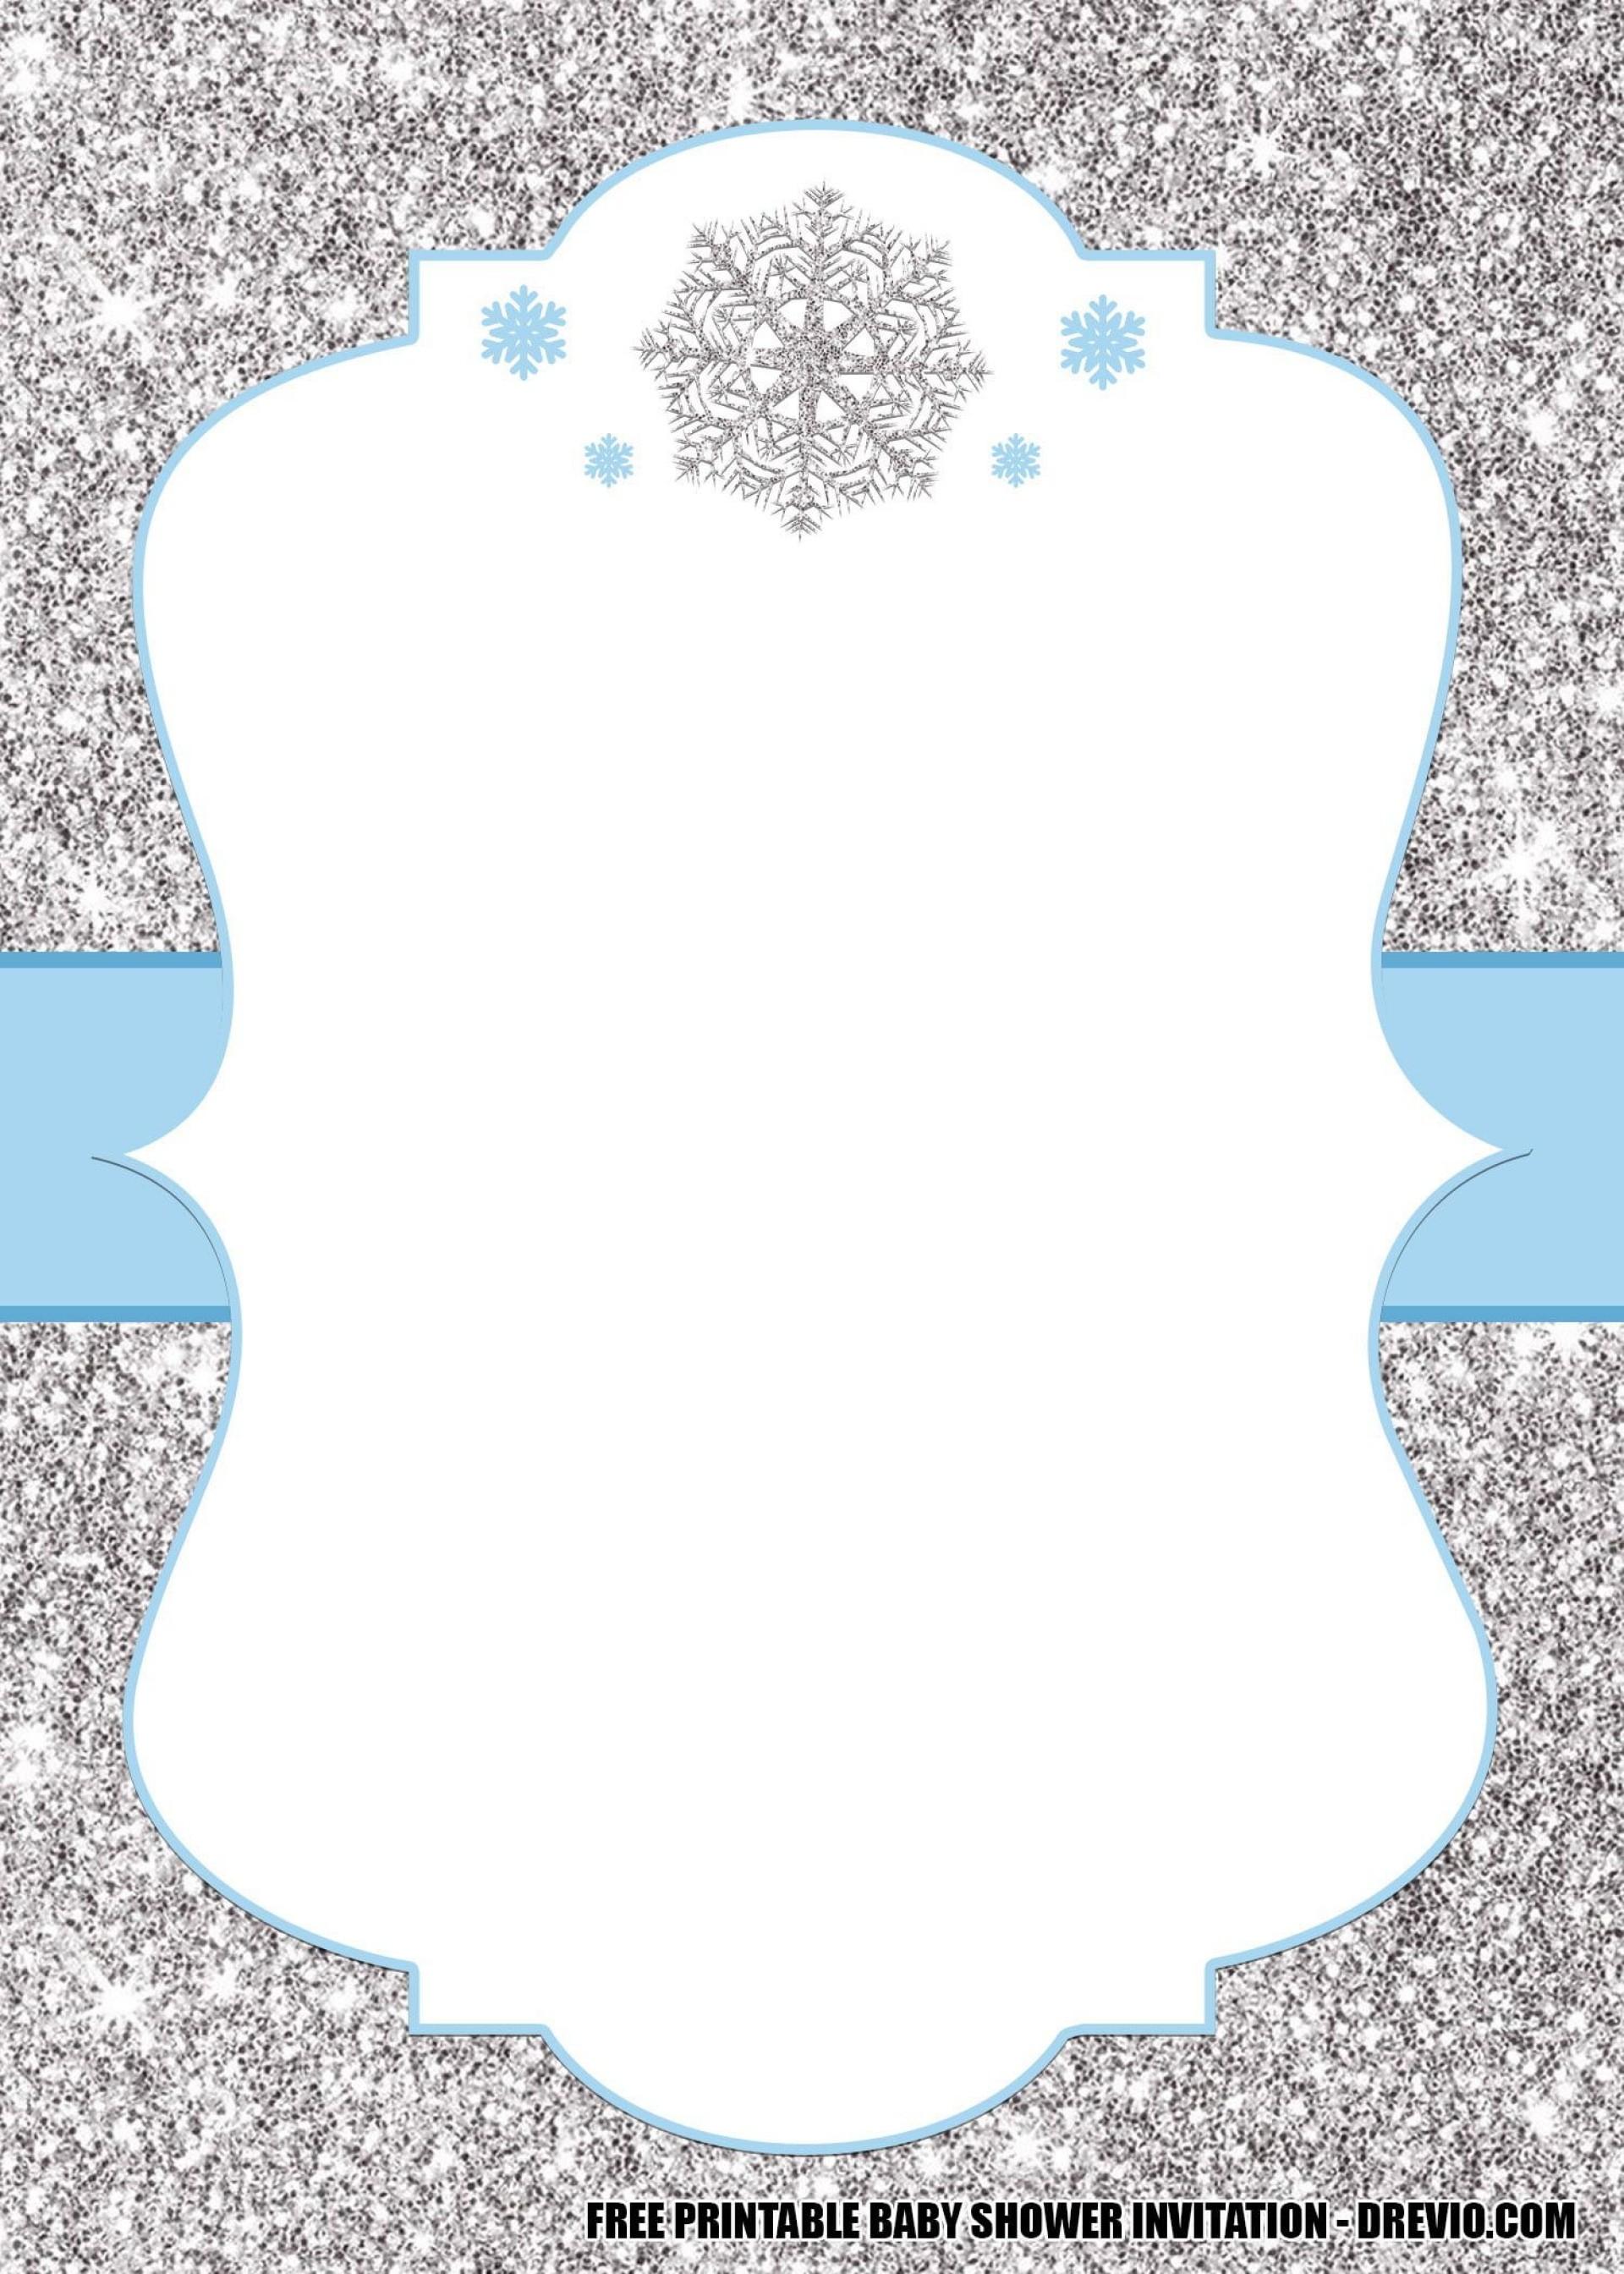 010 Stirring Free Baby Shower Invitation Template Editable Photo  Digital Microsoft Word1920